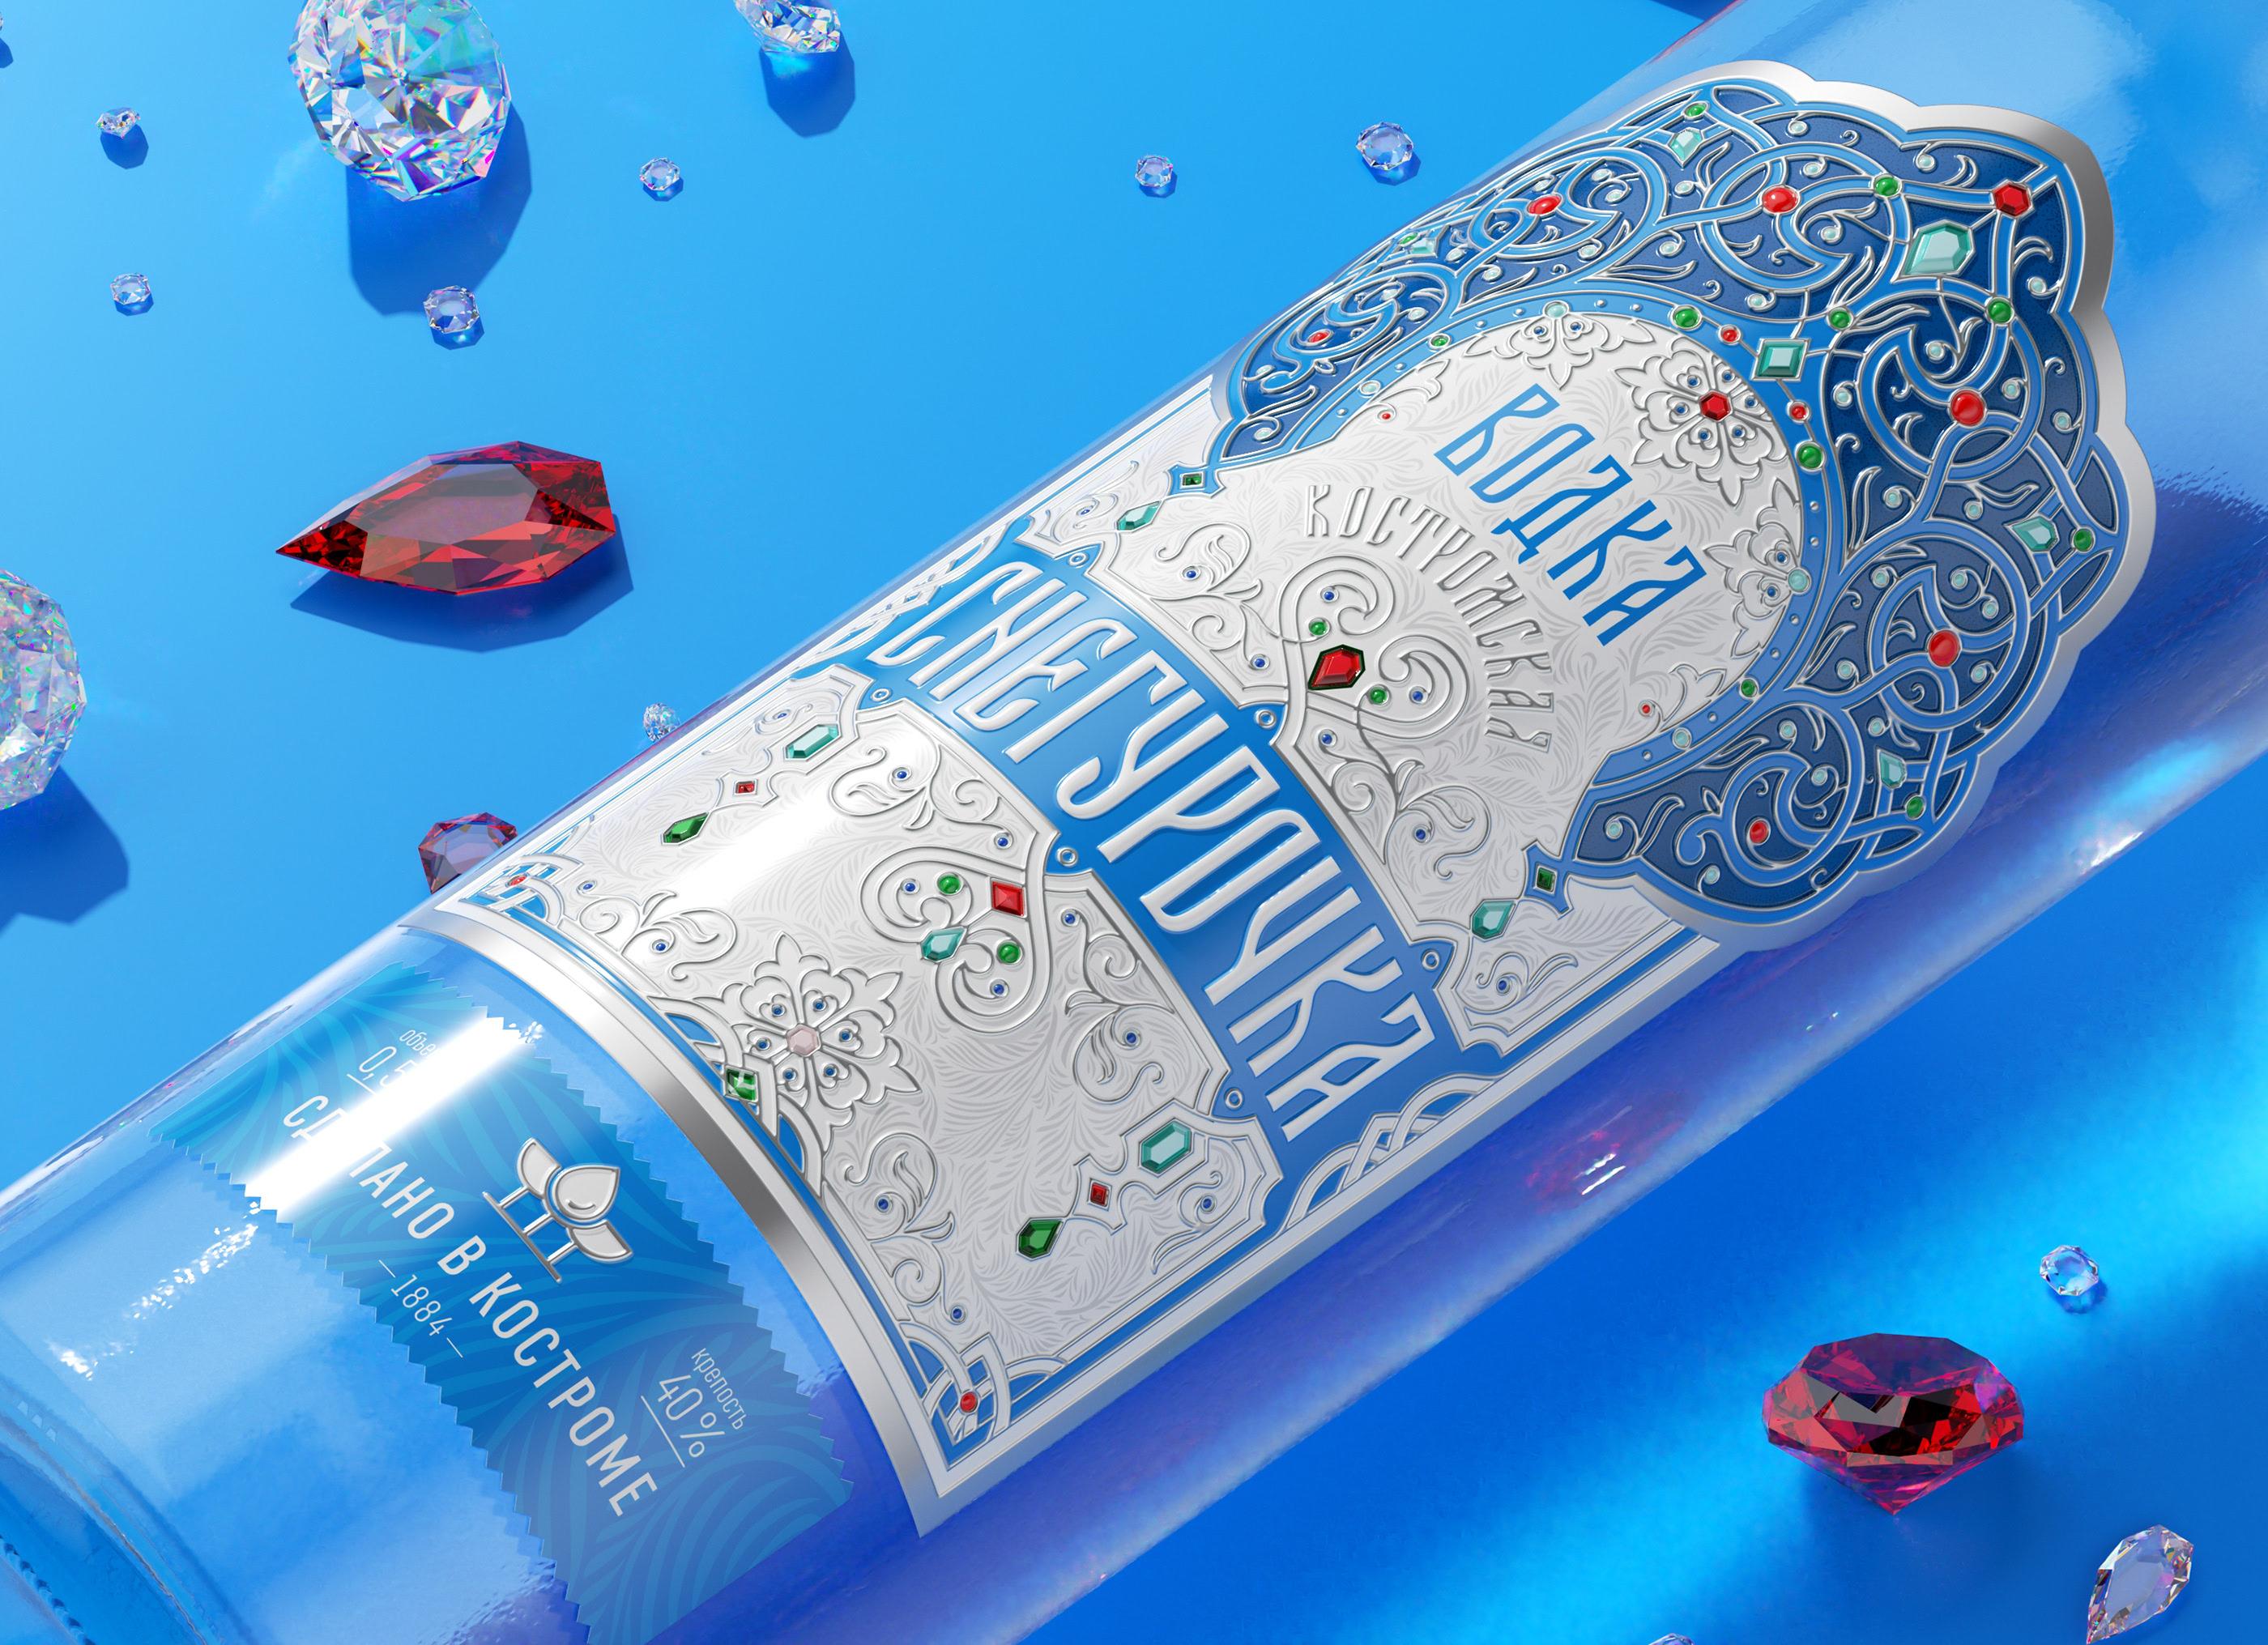 Vodka Design Redesign